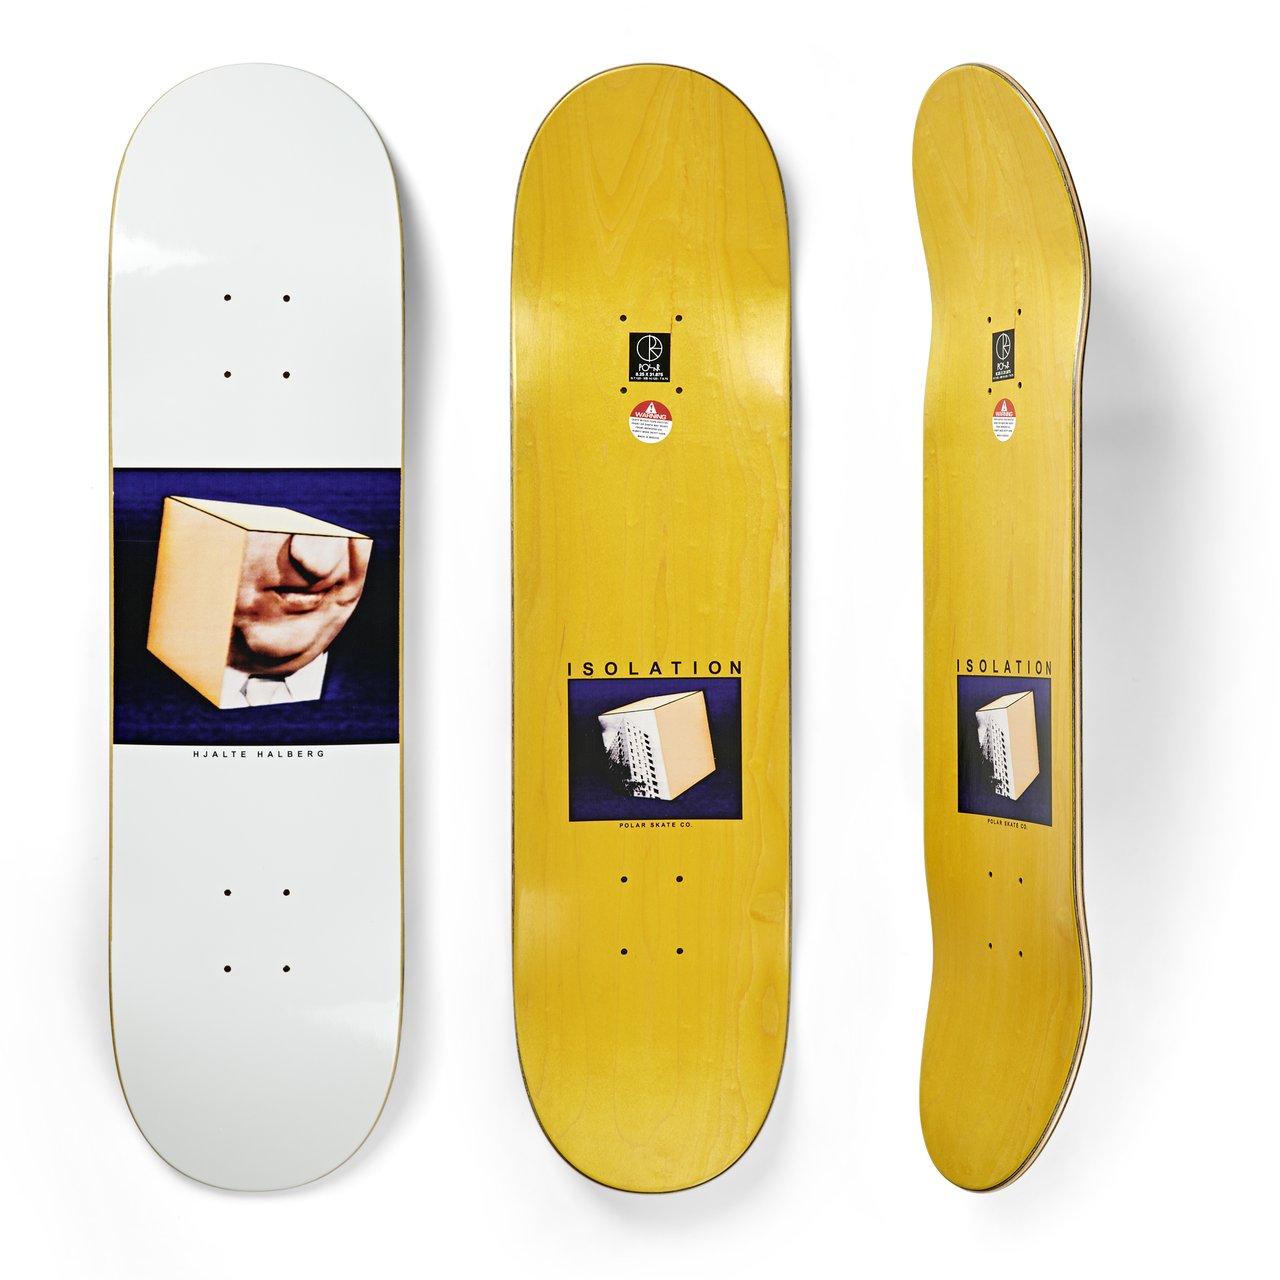 hjalte halberg 8.0 skate board deck polar skate co isolation